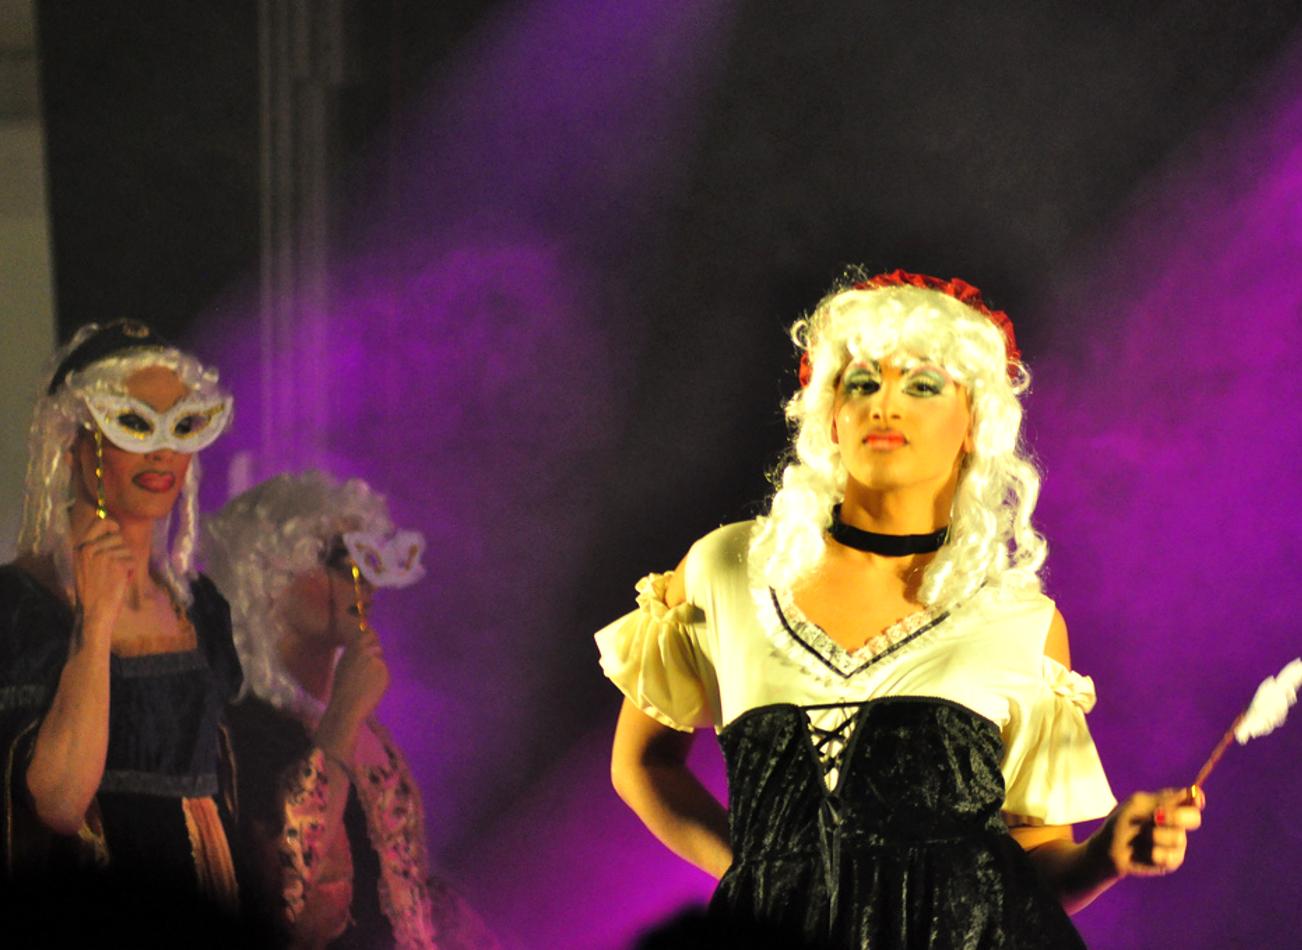 dîner avec spectacle de drag queen amsterdam activites vimigo